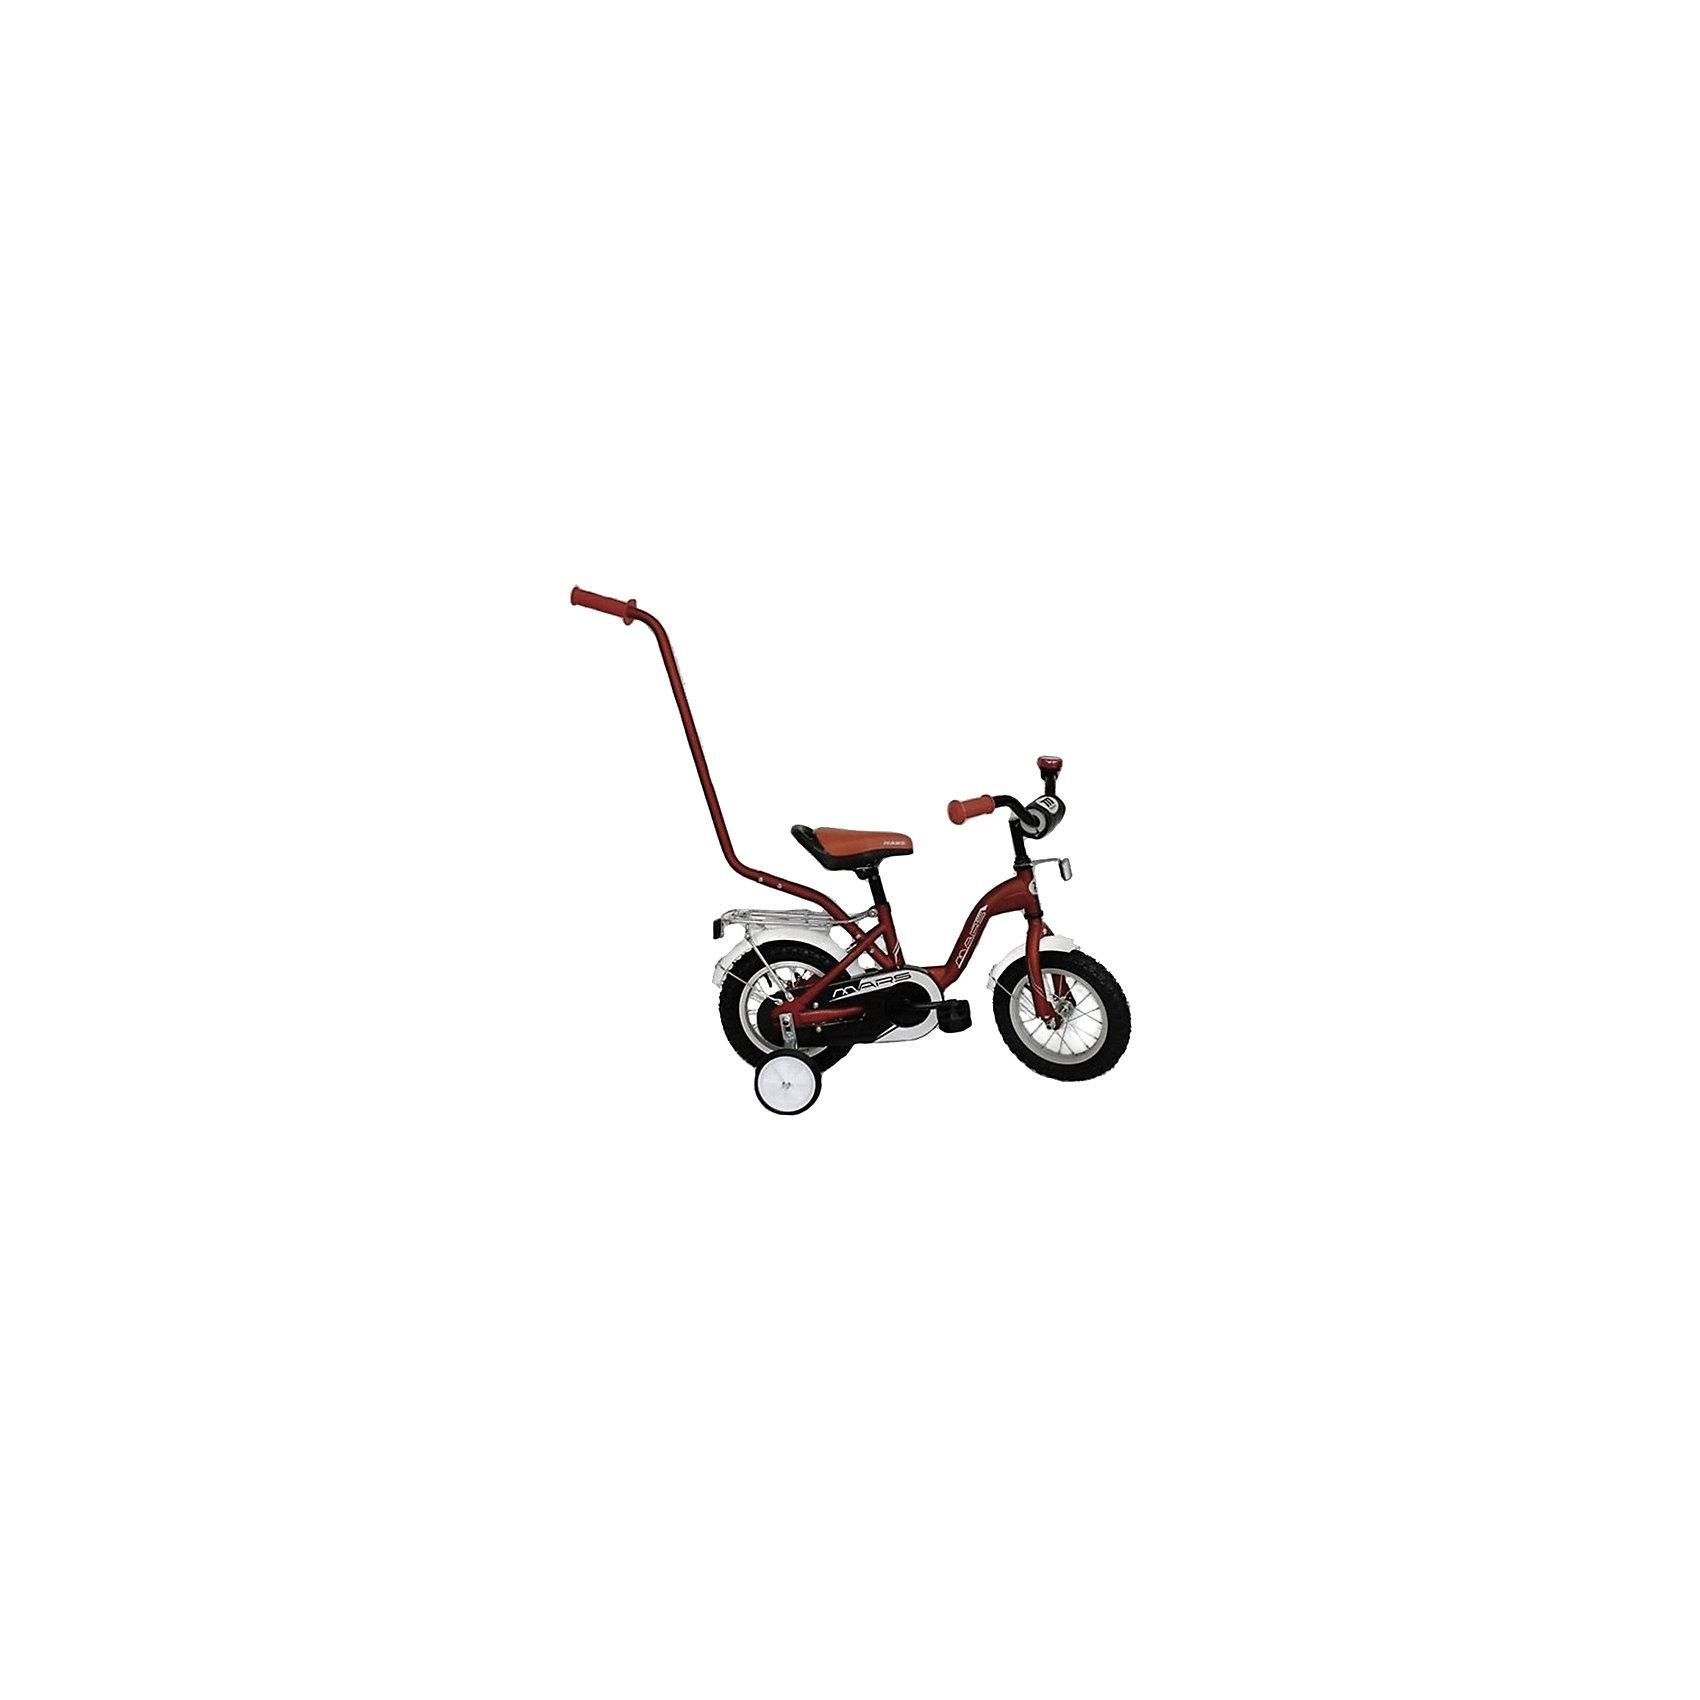 Велосипед, NEW MARS, коричневыйВелосипеды детские<br><br><br>Ширина мм: 500<br>Глубина мм: 500<br>Высота мм: 1000<br>Вес г: 10000<br>Возраст от месяцев: 24<br>Возраст до месяцев: 60<br>Пол: Унисекс<br>Возраст: Детский<br>SKU: 4785494